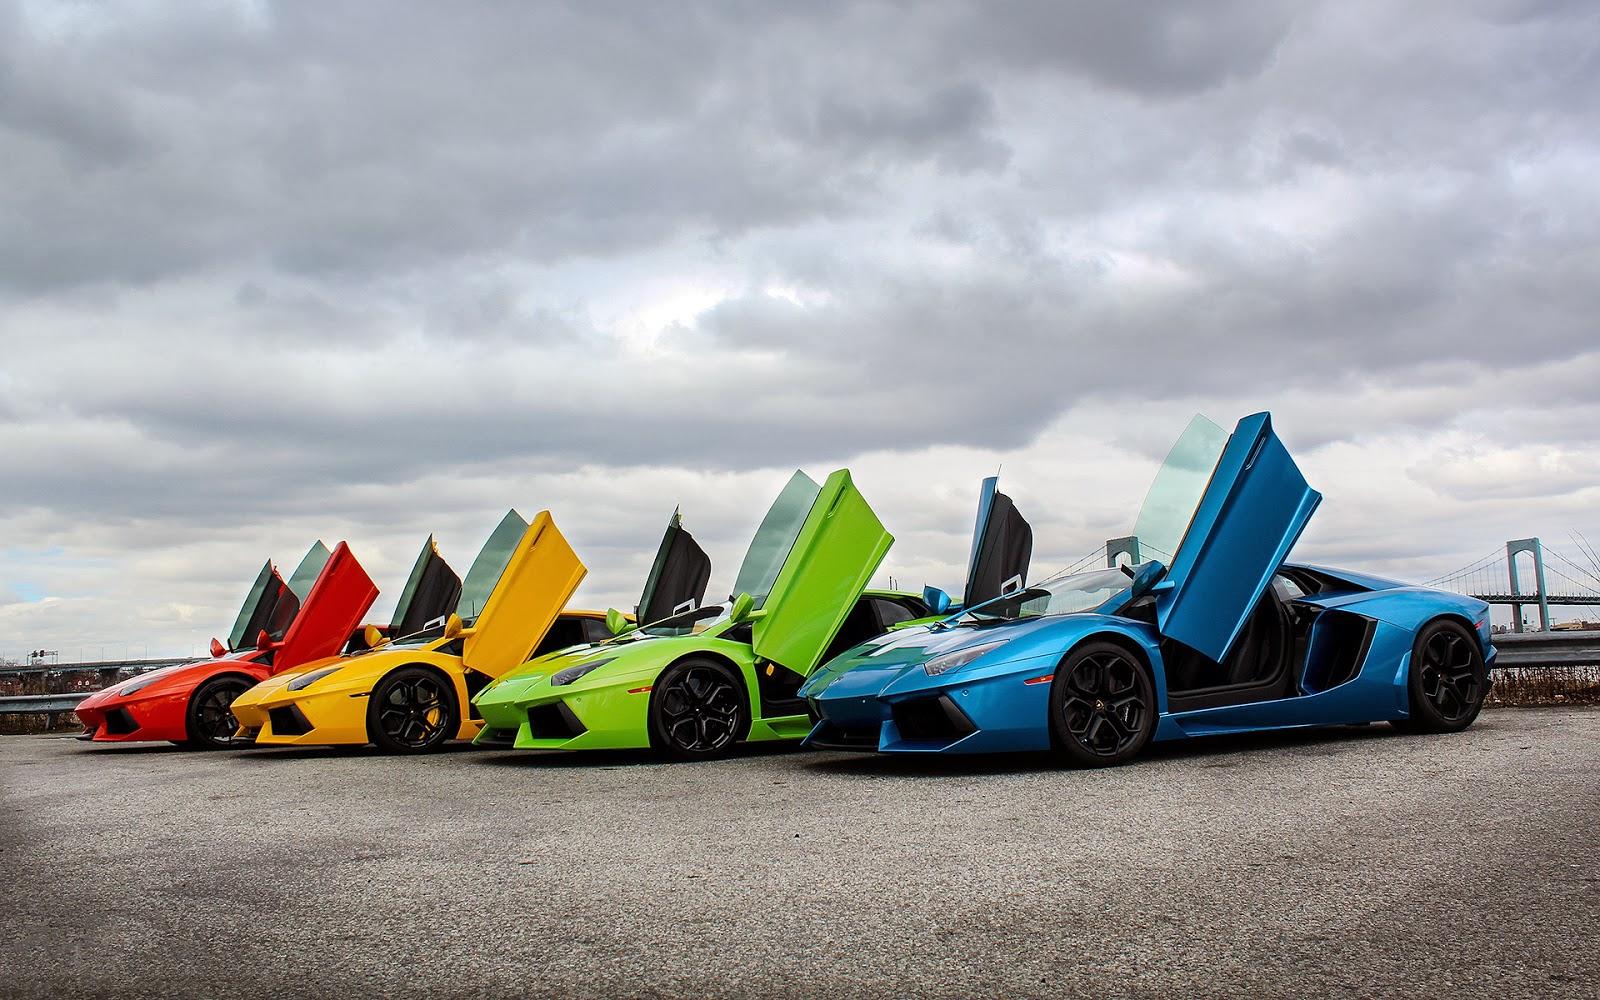 Most Inspiring Wallpaper High Quality Lamborghini - 4+Lamborghini+supercars+rainbow  2018_434346.jpg